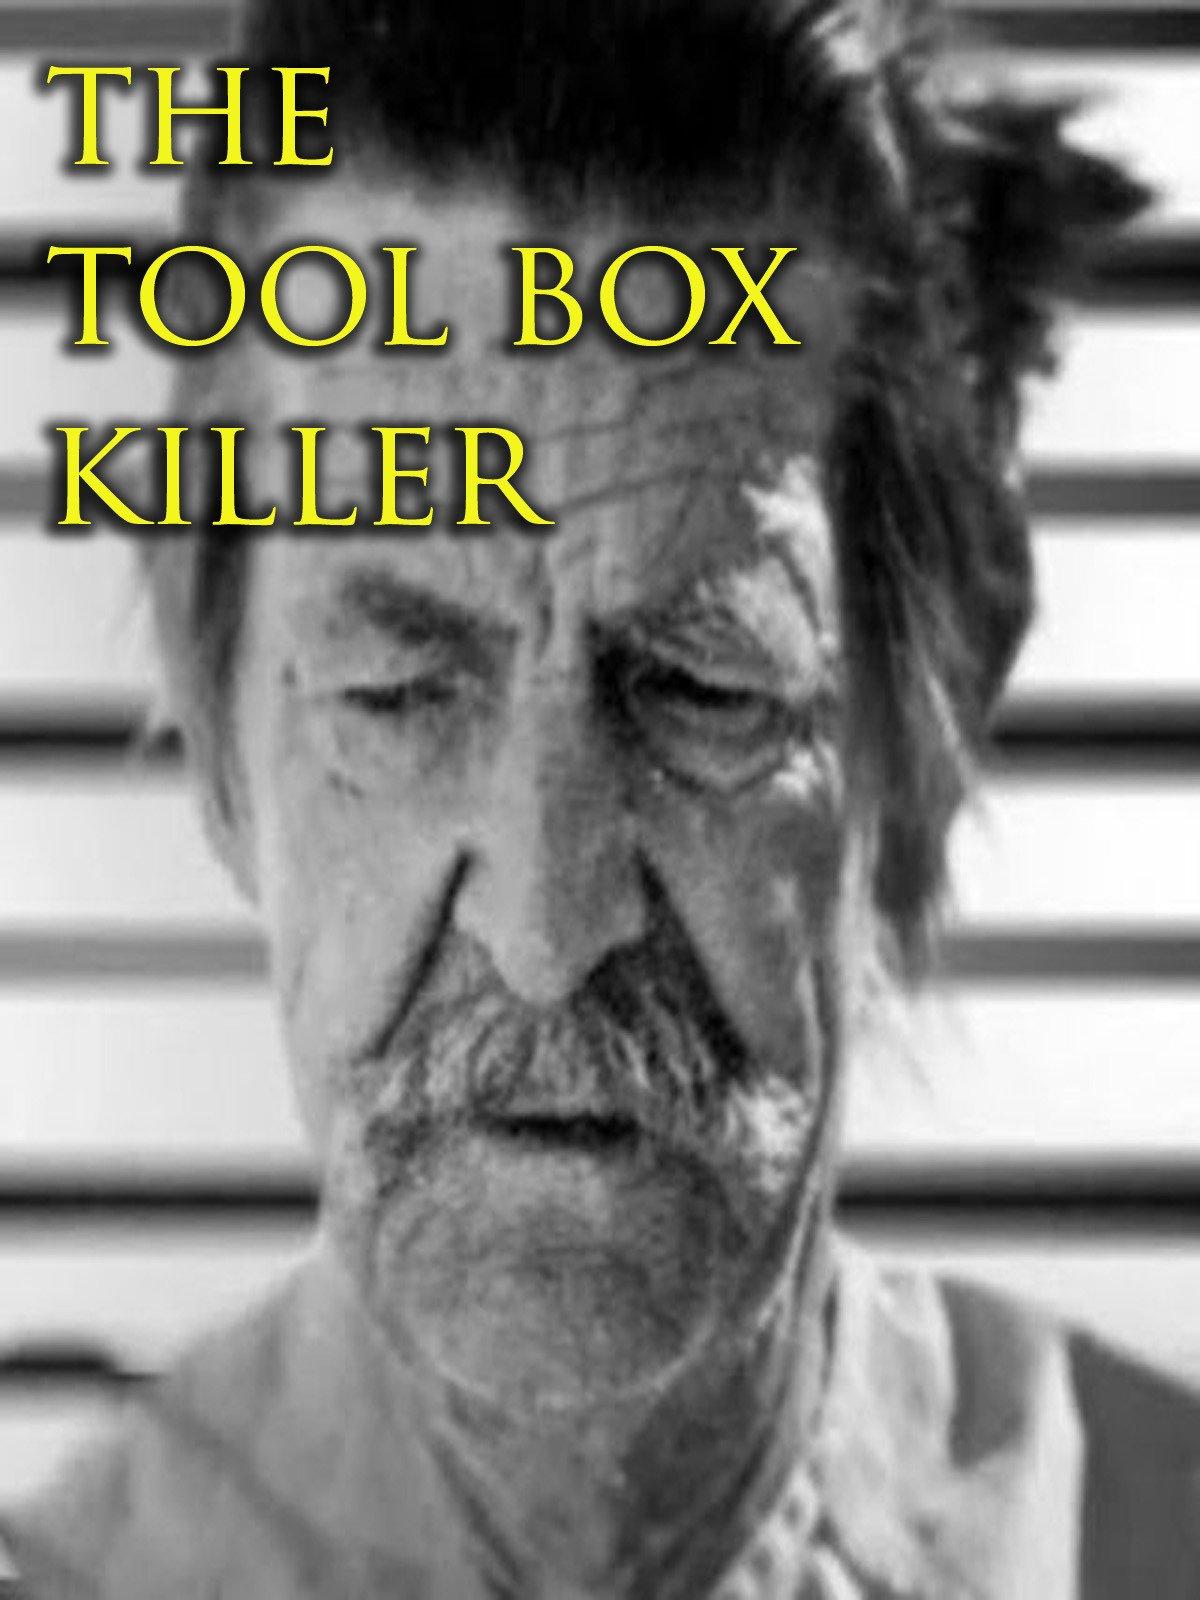 Amazon.de The Toy Box Killer [OV] ansehen   Prime Video